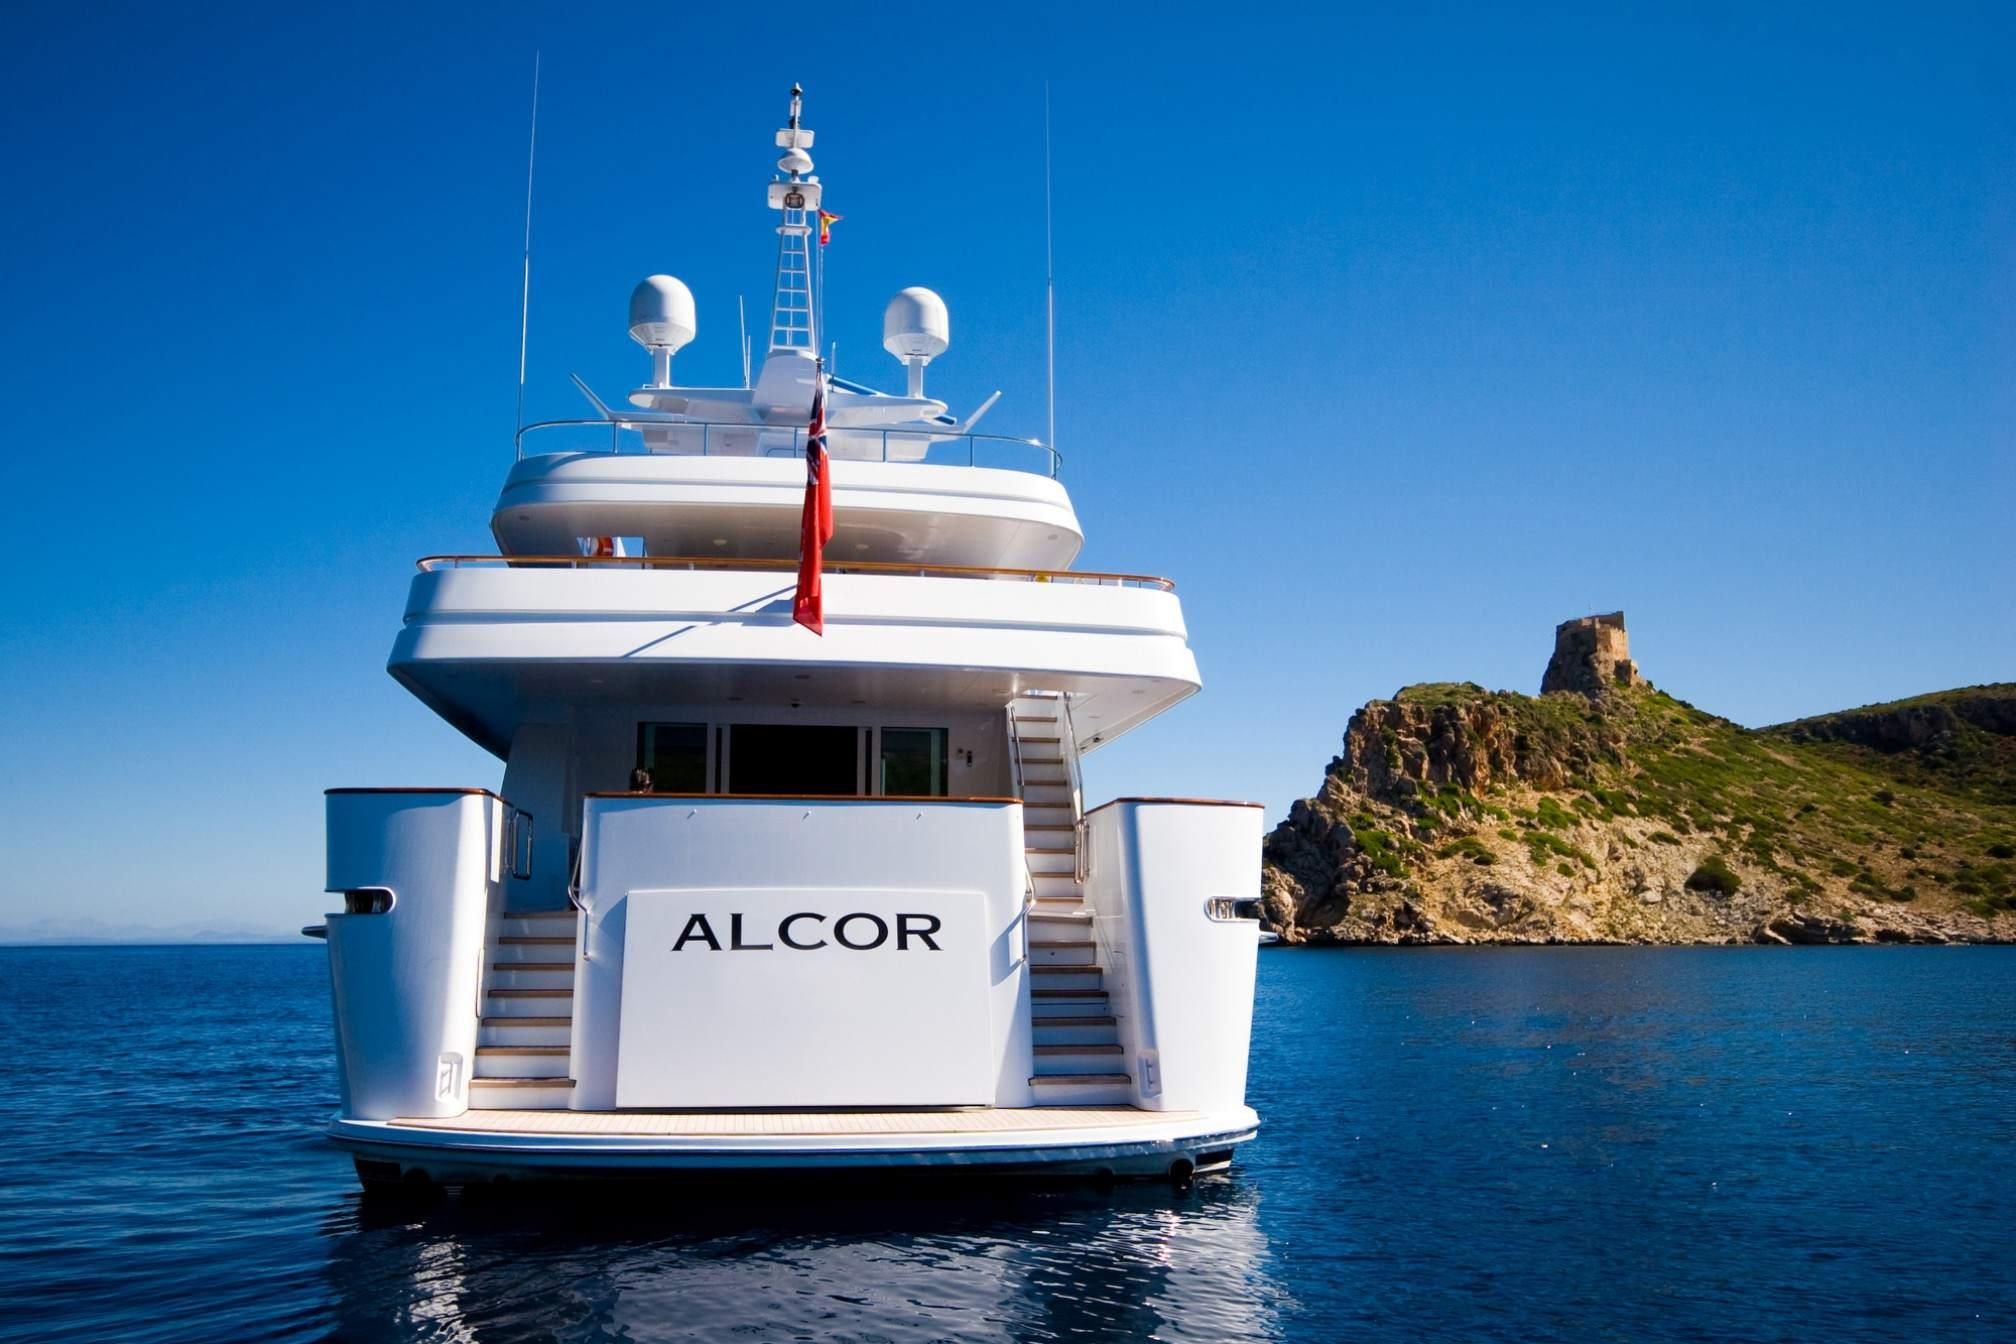 ALCOR yacht charter anchored